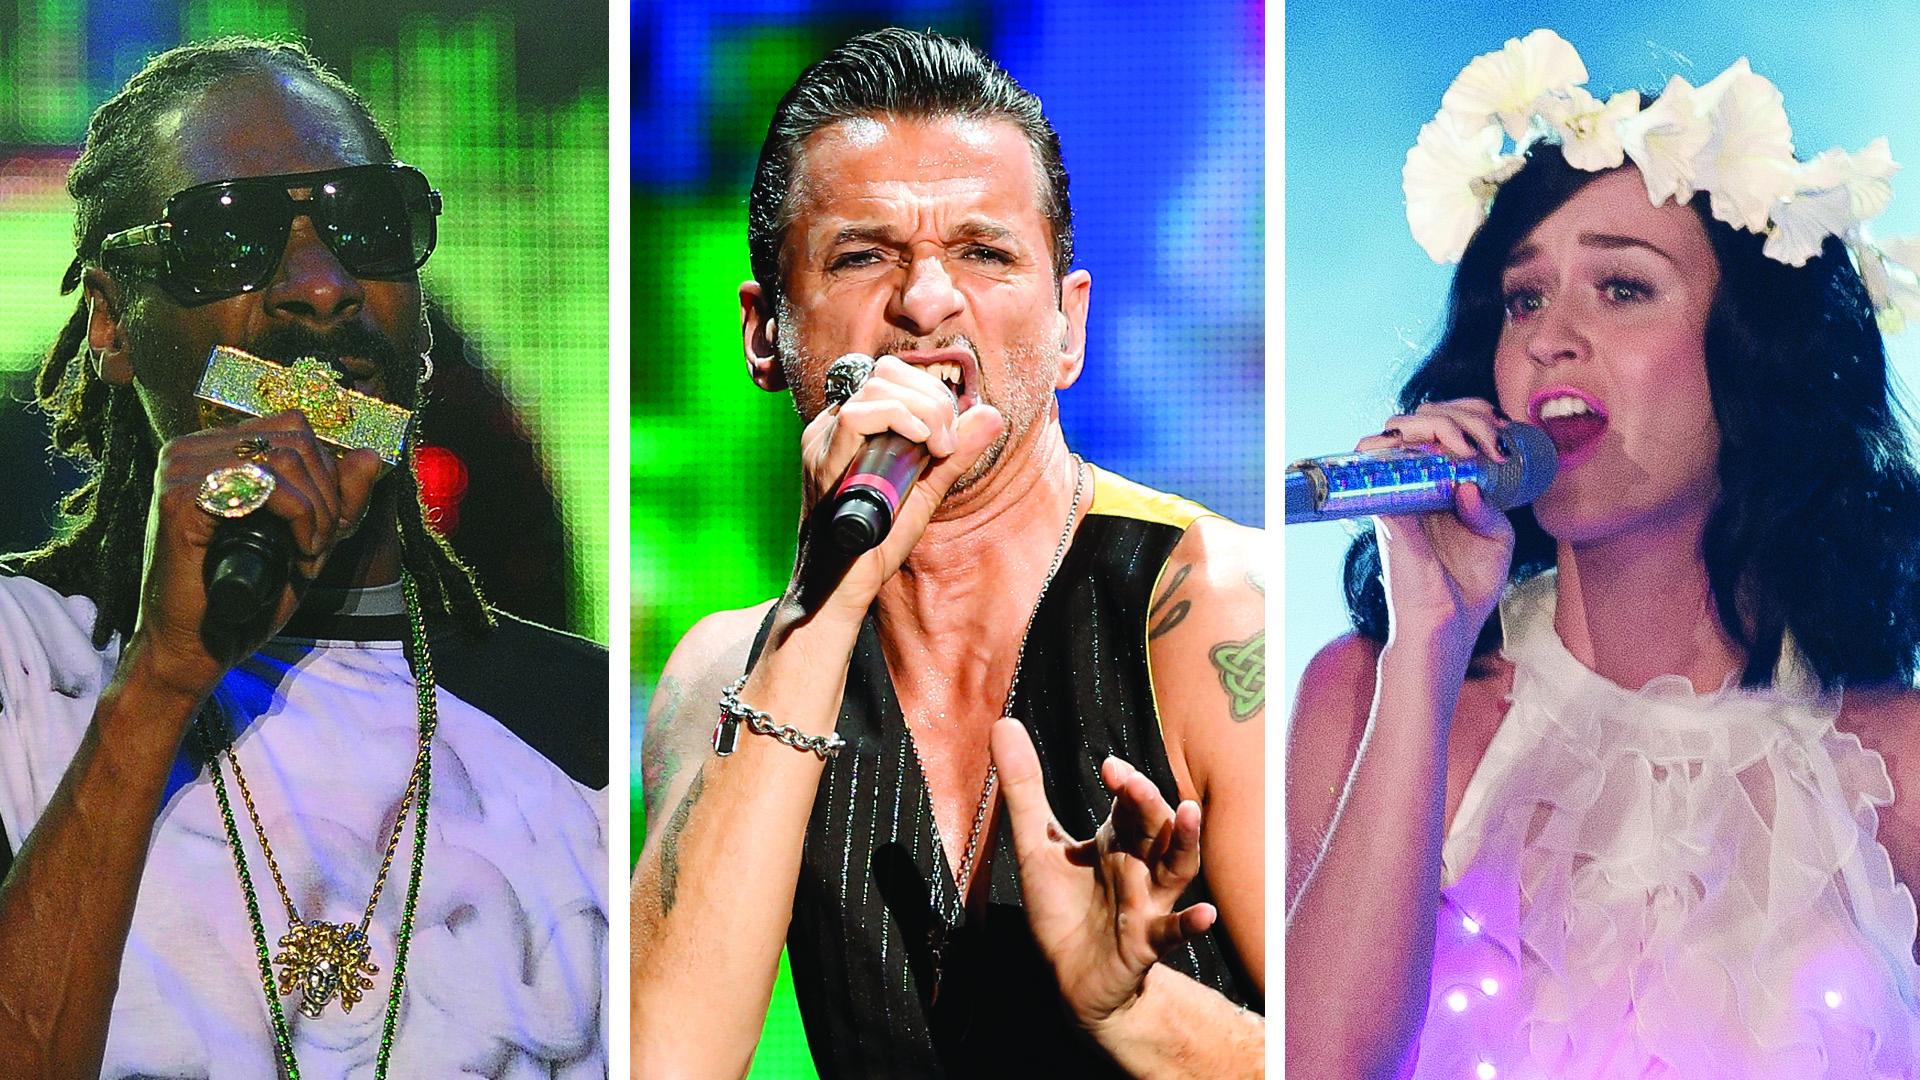 Image: Depeche Mode, Snoop Dogg, Katy Perry